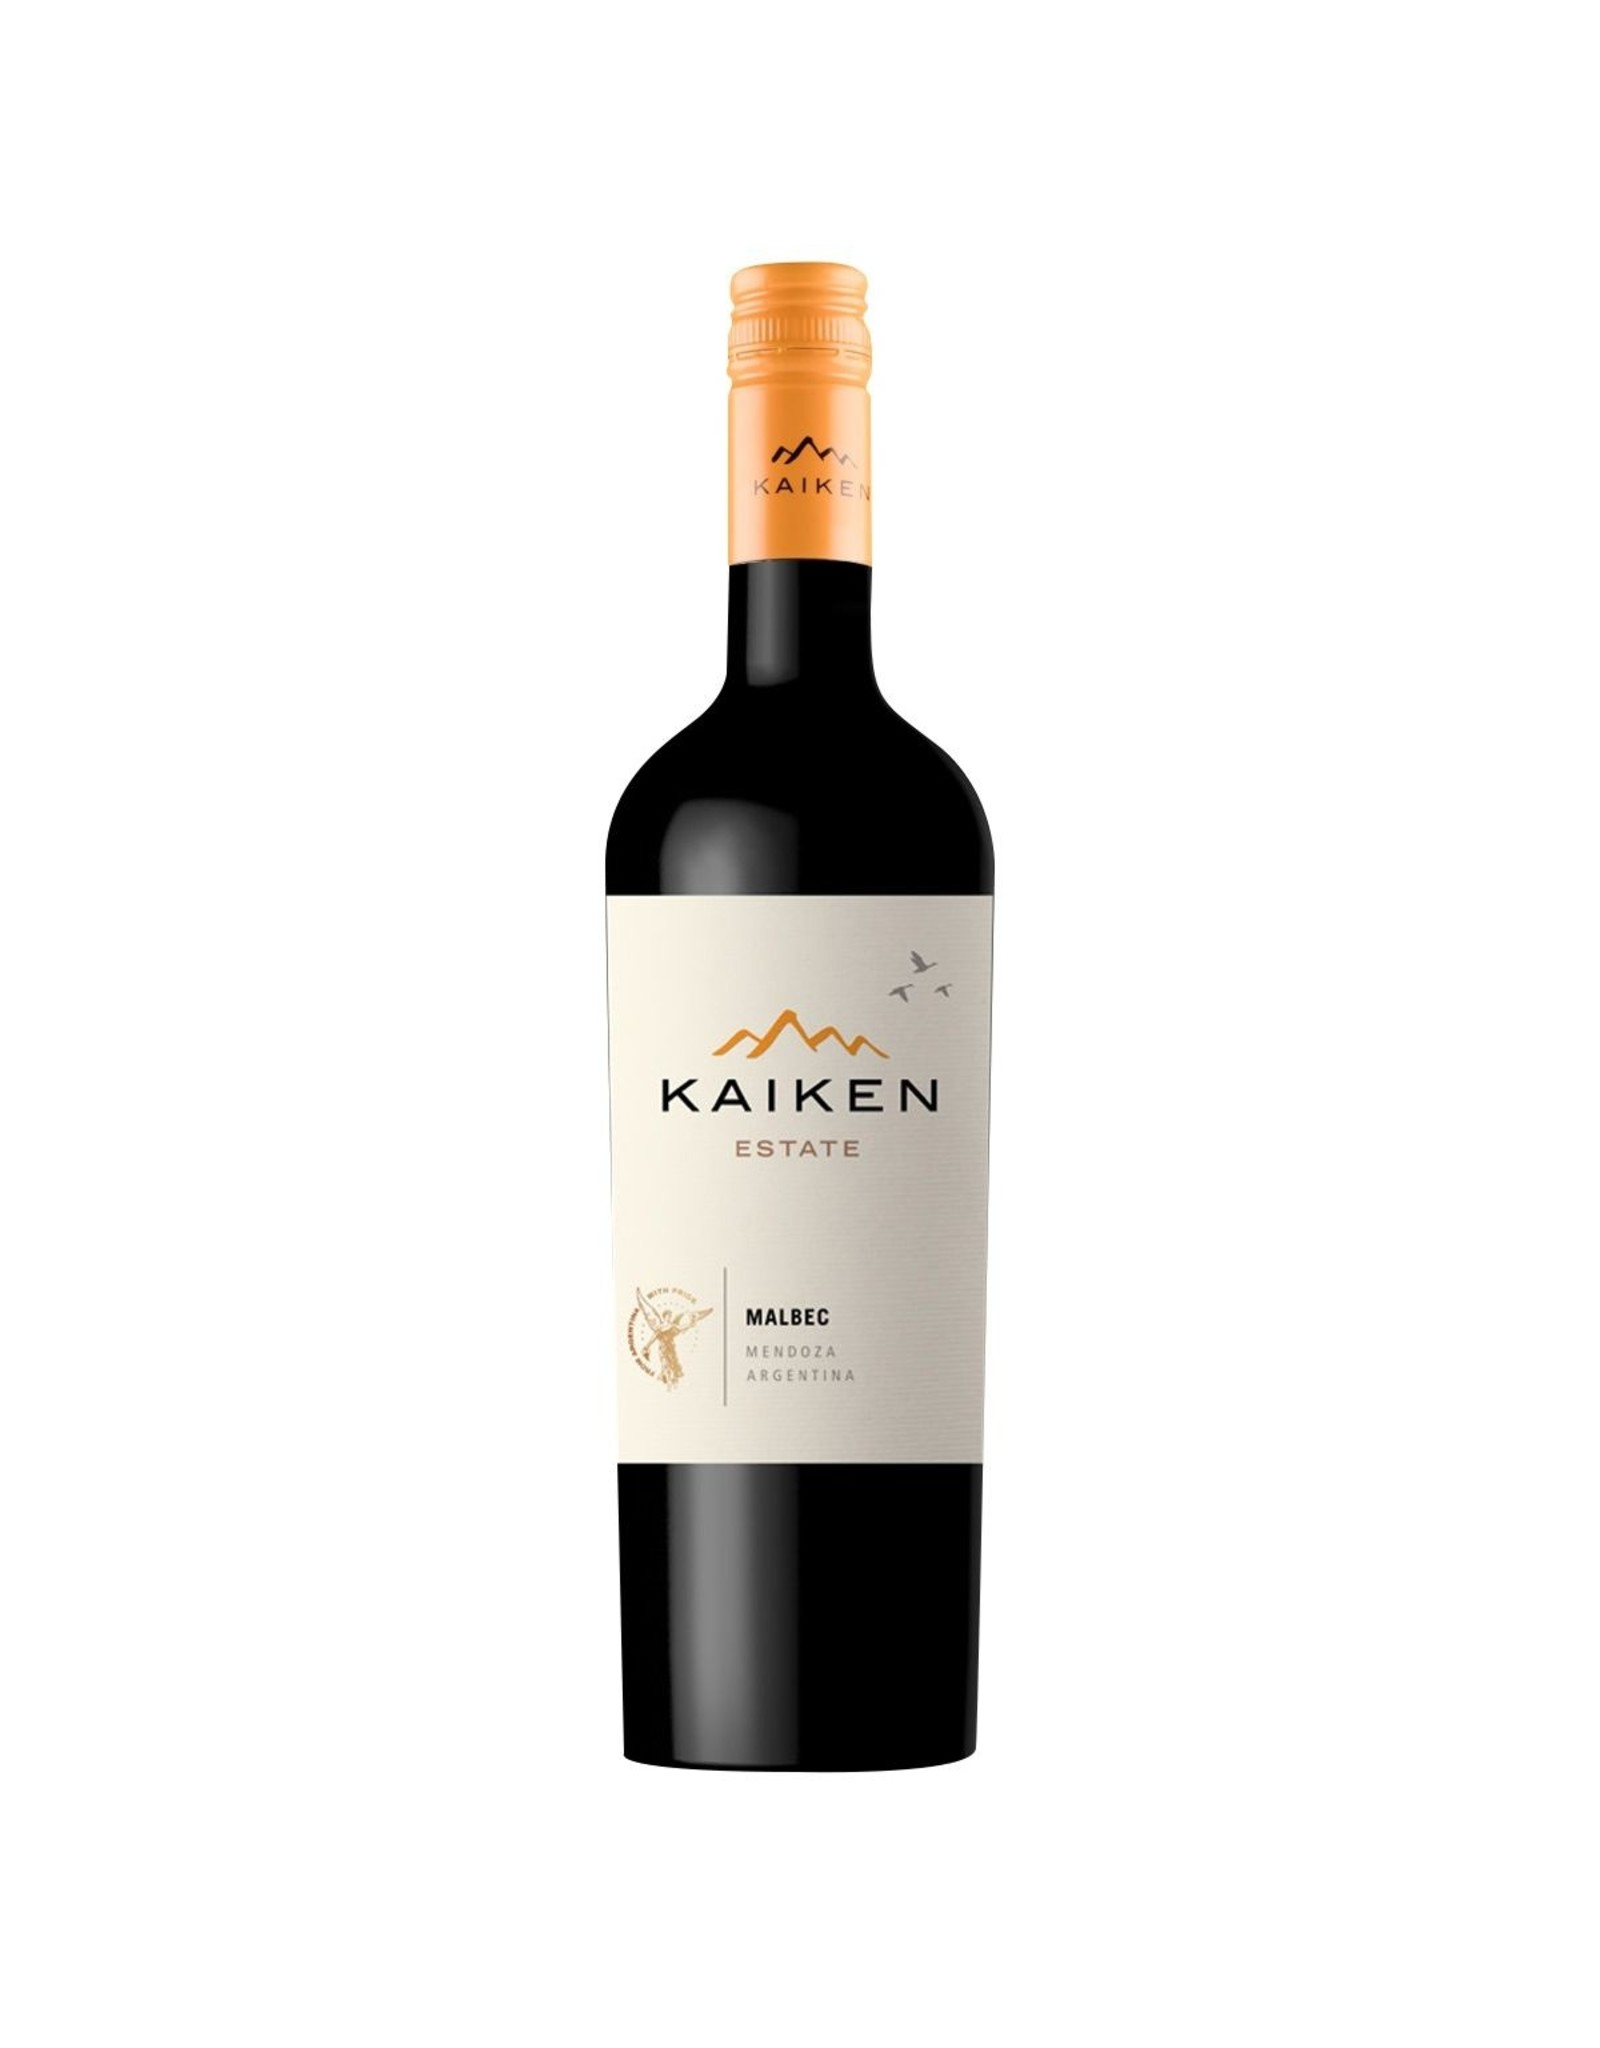 Kaiken Estate, Argentinië *** AANBIEDING*** Kaiken Estate Malbec 2018, Mendoza, Argentinië